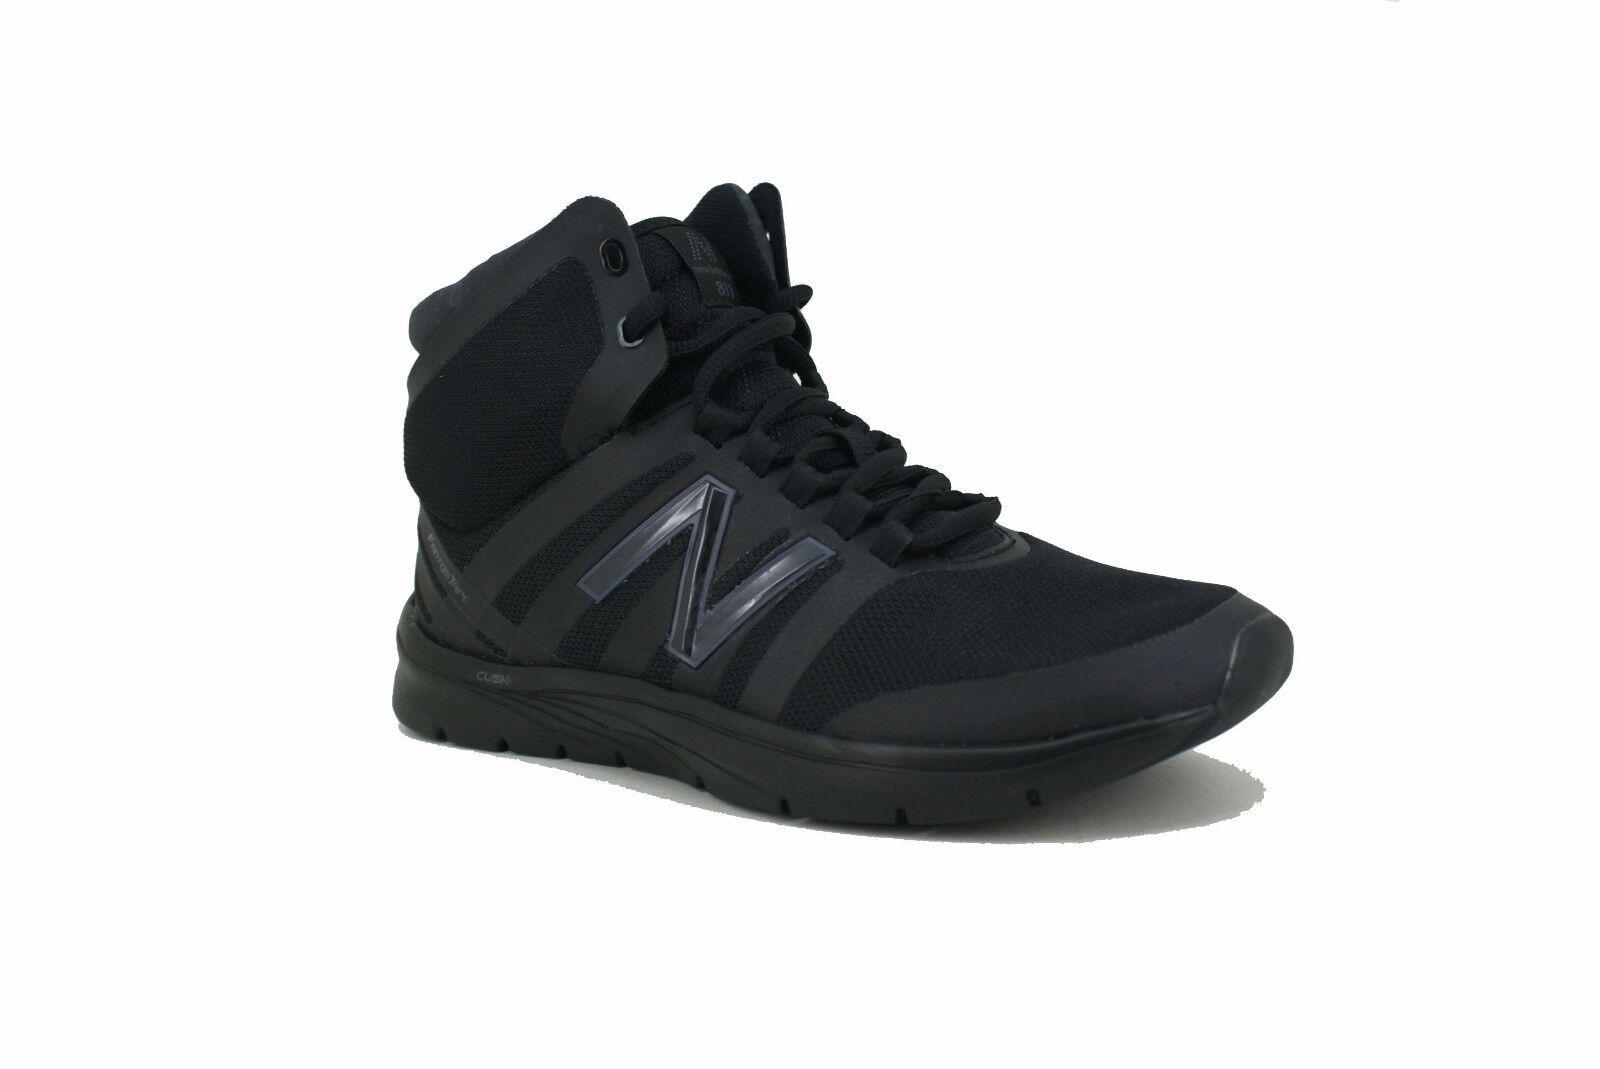 BRAND NEW New Balance 811 V2 Mid Cut Black Running Training Shoes Women's sz 5.5